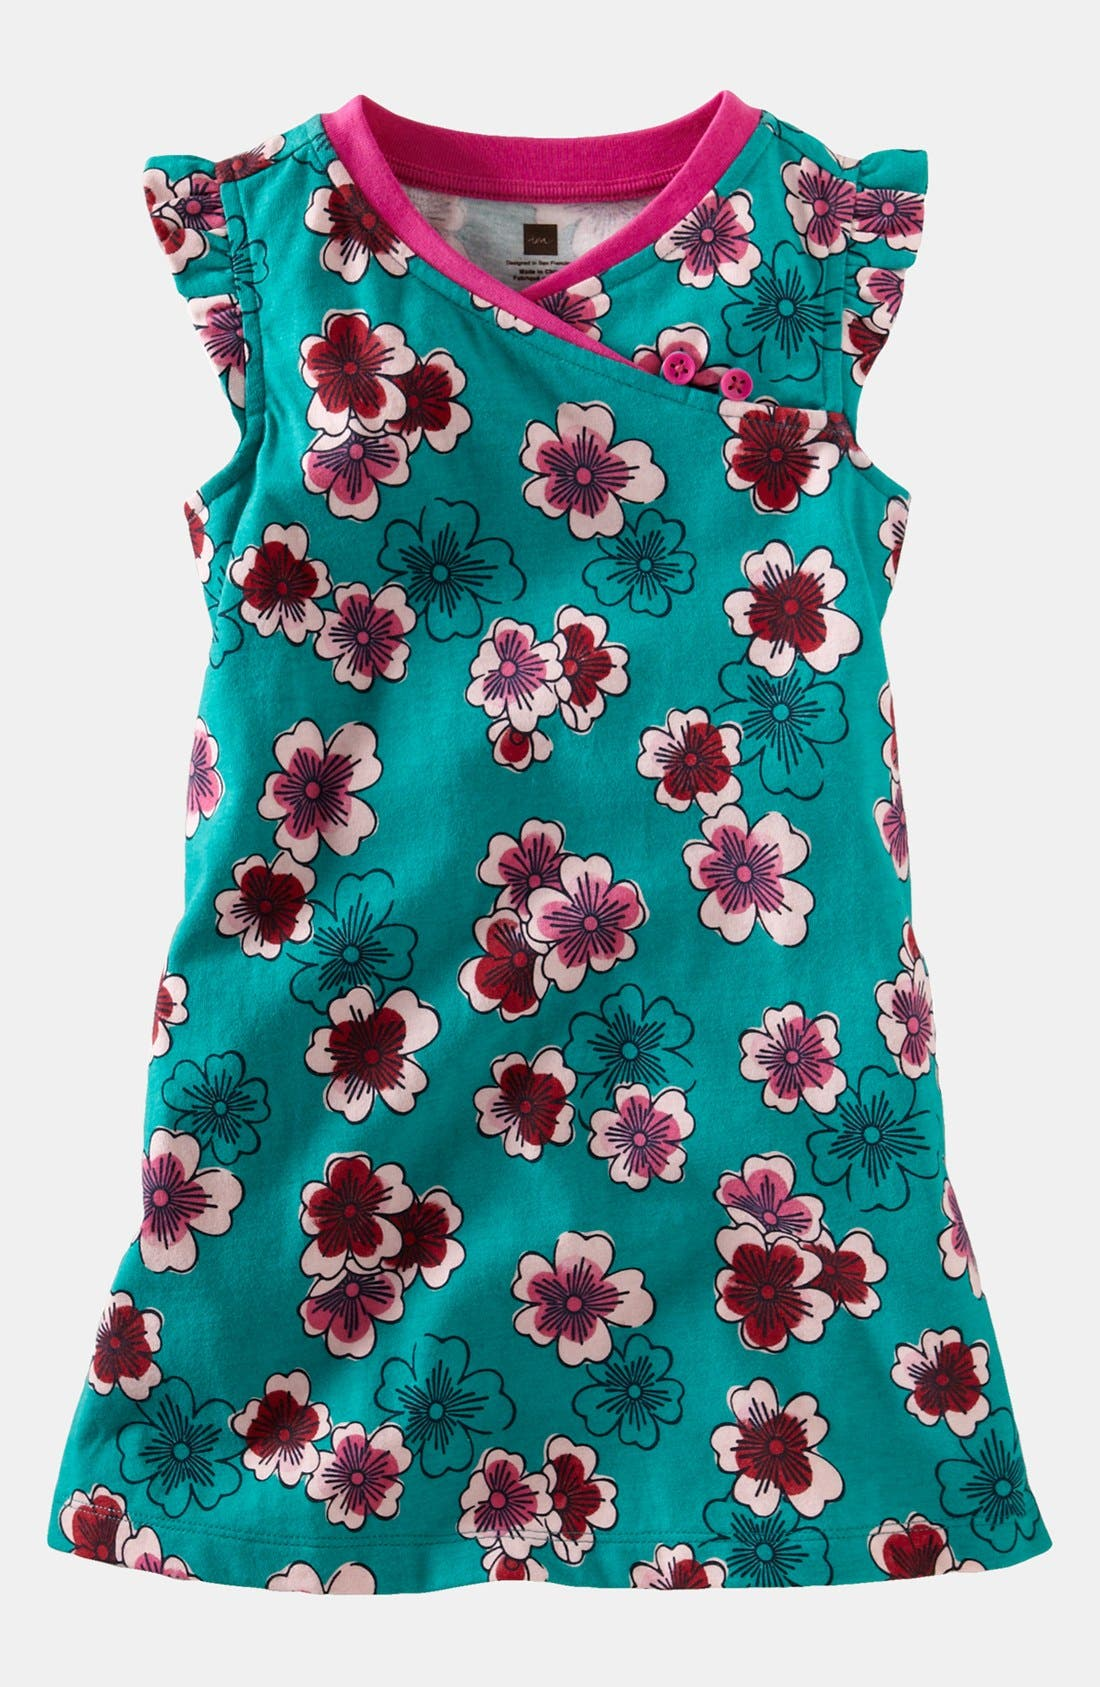 Alternate Image 1 Selected - Tea Collection 'Plum Blossom' Minidress (Little Girls & Big Girls)